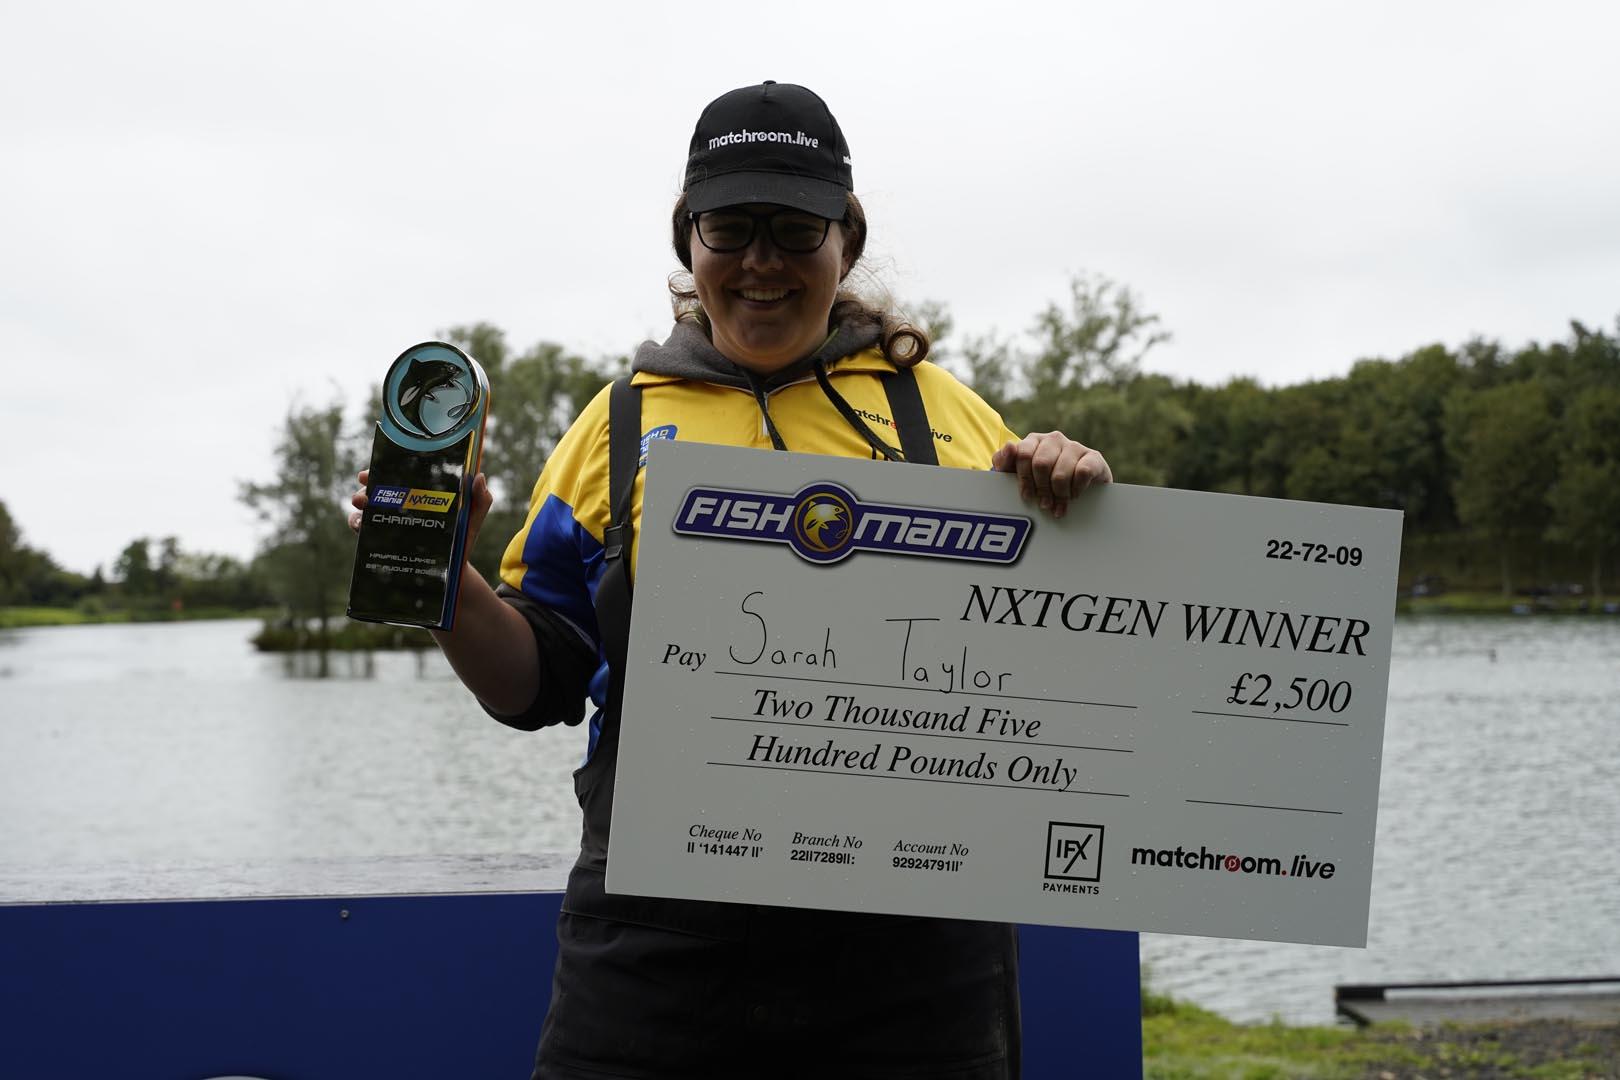 SARAH TAYLOR IS FISHOMANIA NXTGEN CHAMPION